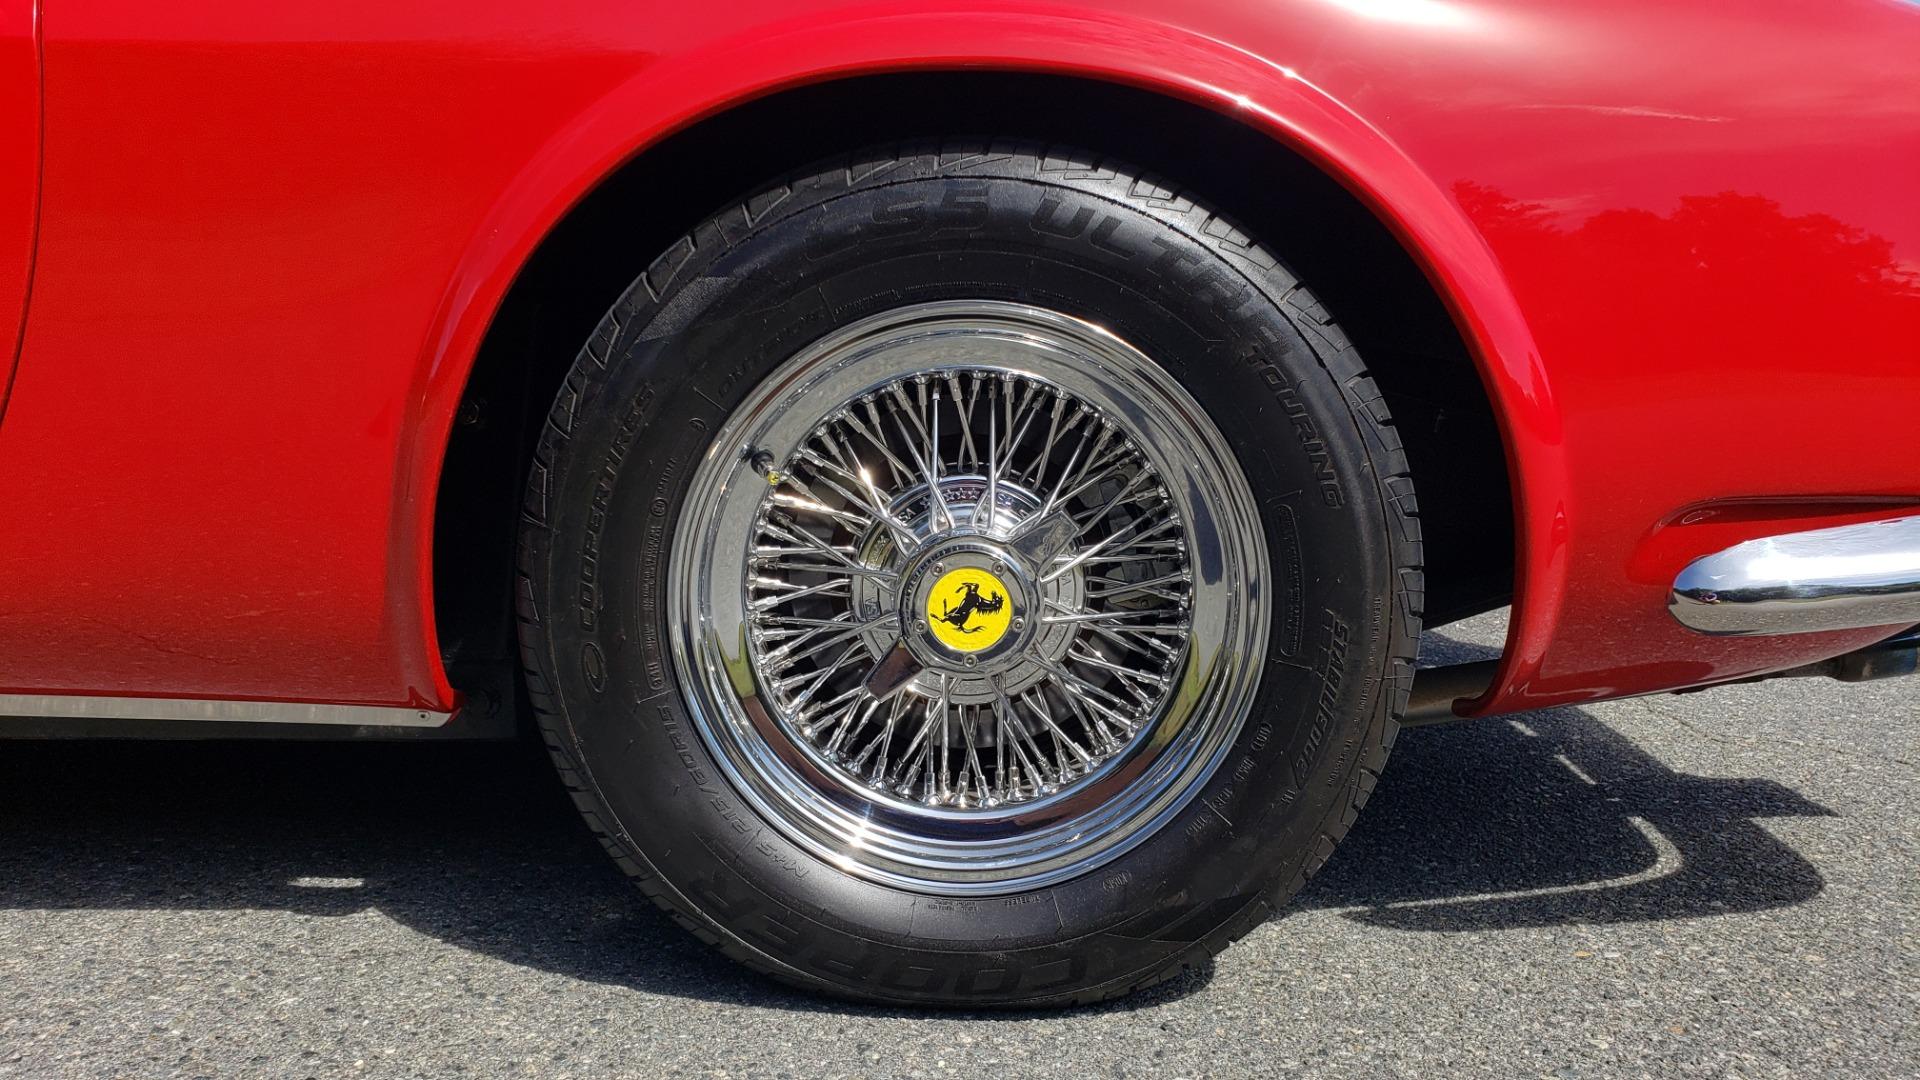 Used 1961 Ferrari 250GT SWB CALIFORNIA REPLICA / 302CI V8 / TREMEC 5-SPEED for sale Sold at Formula Imports in Charlotte NC 28227 57